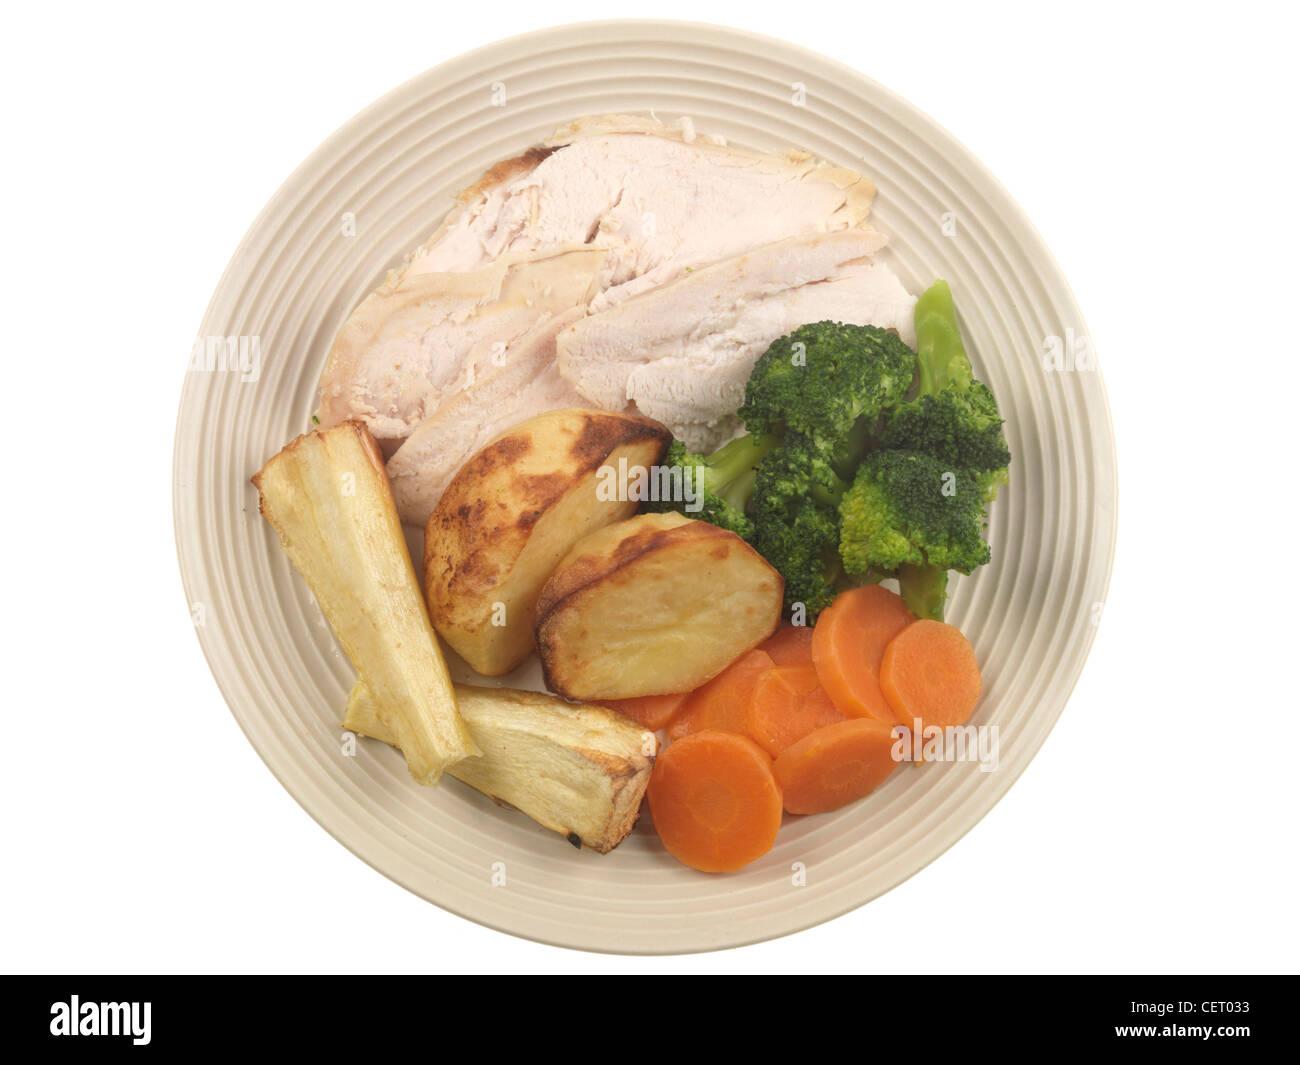 Roast Chicken Dinner - Stock Image